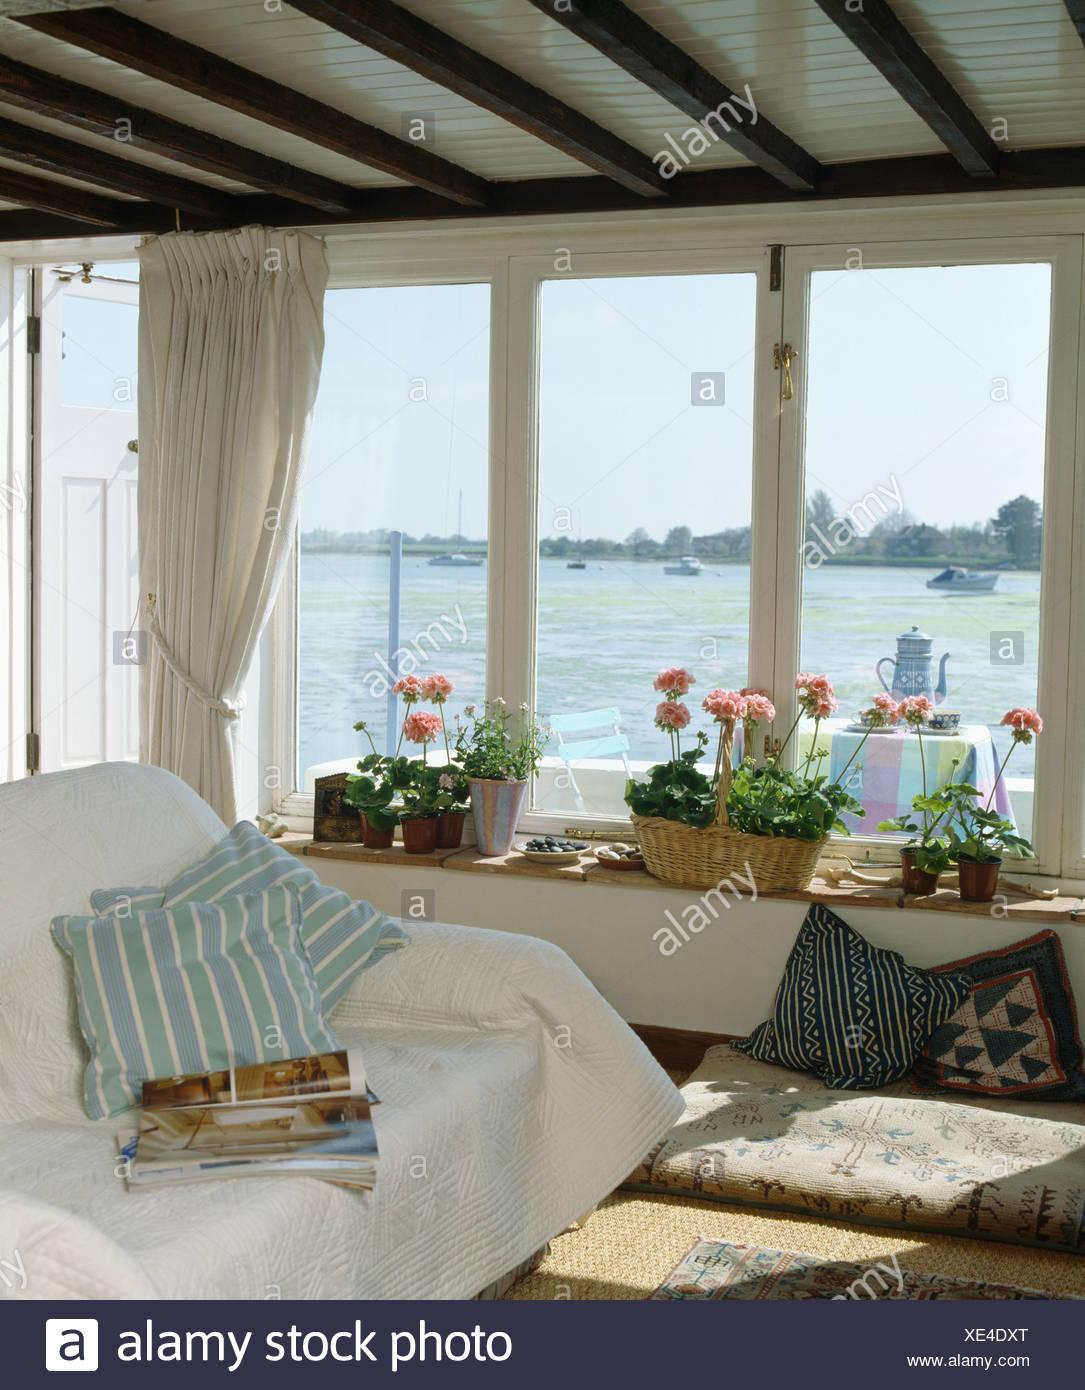 White Throw And Blue Striped Cushion On Sofa In Coastal